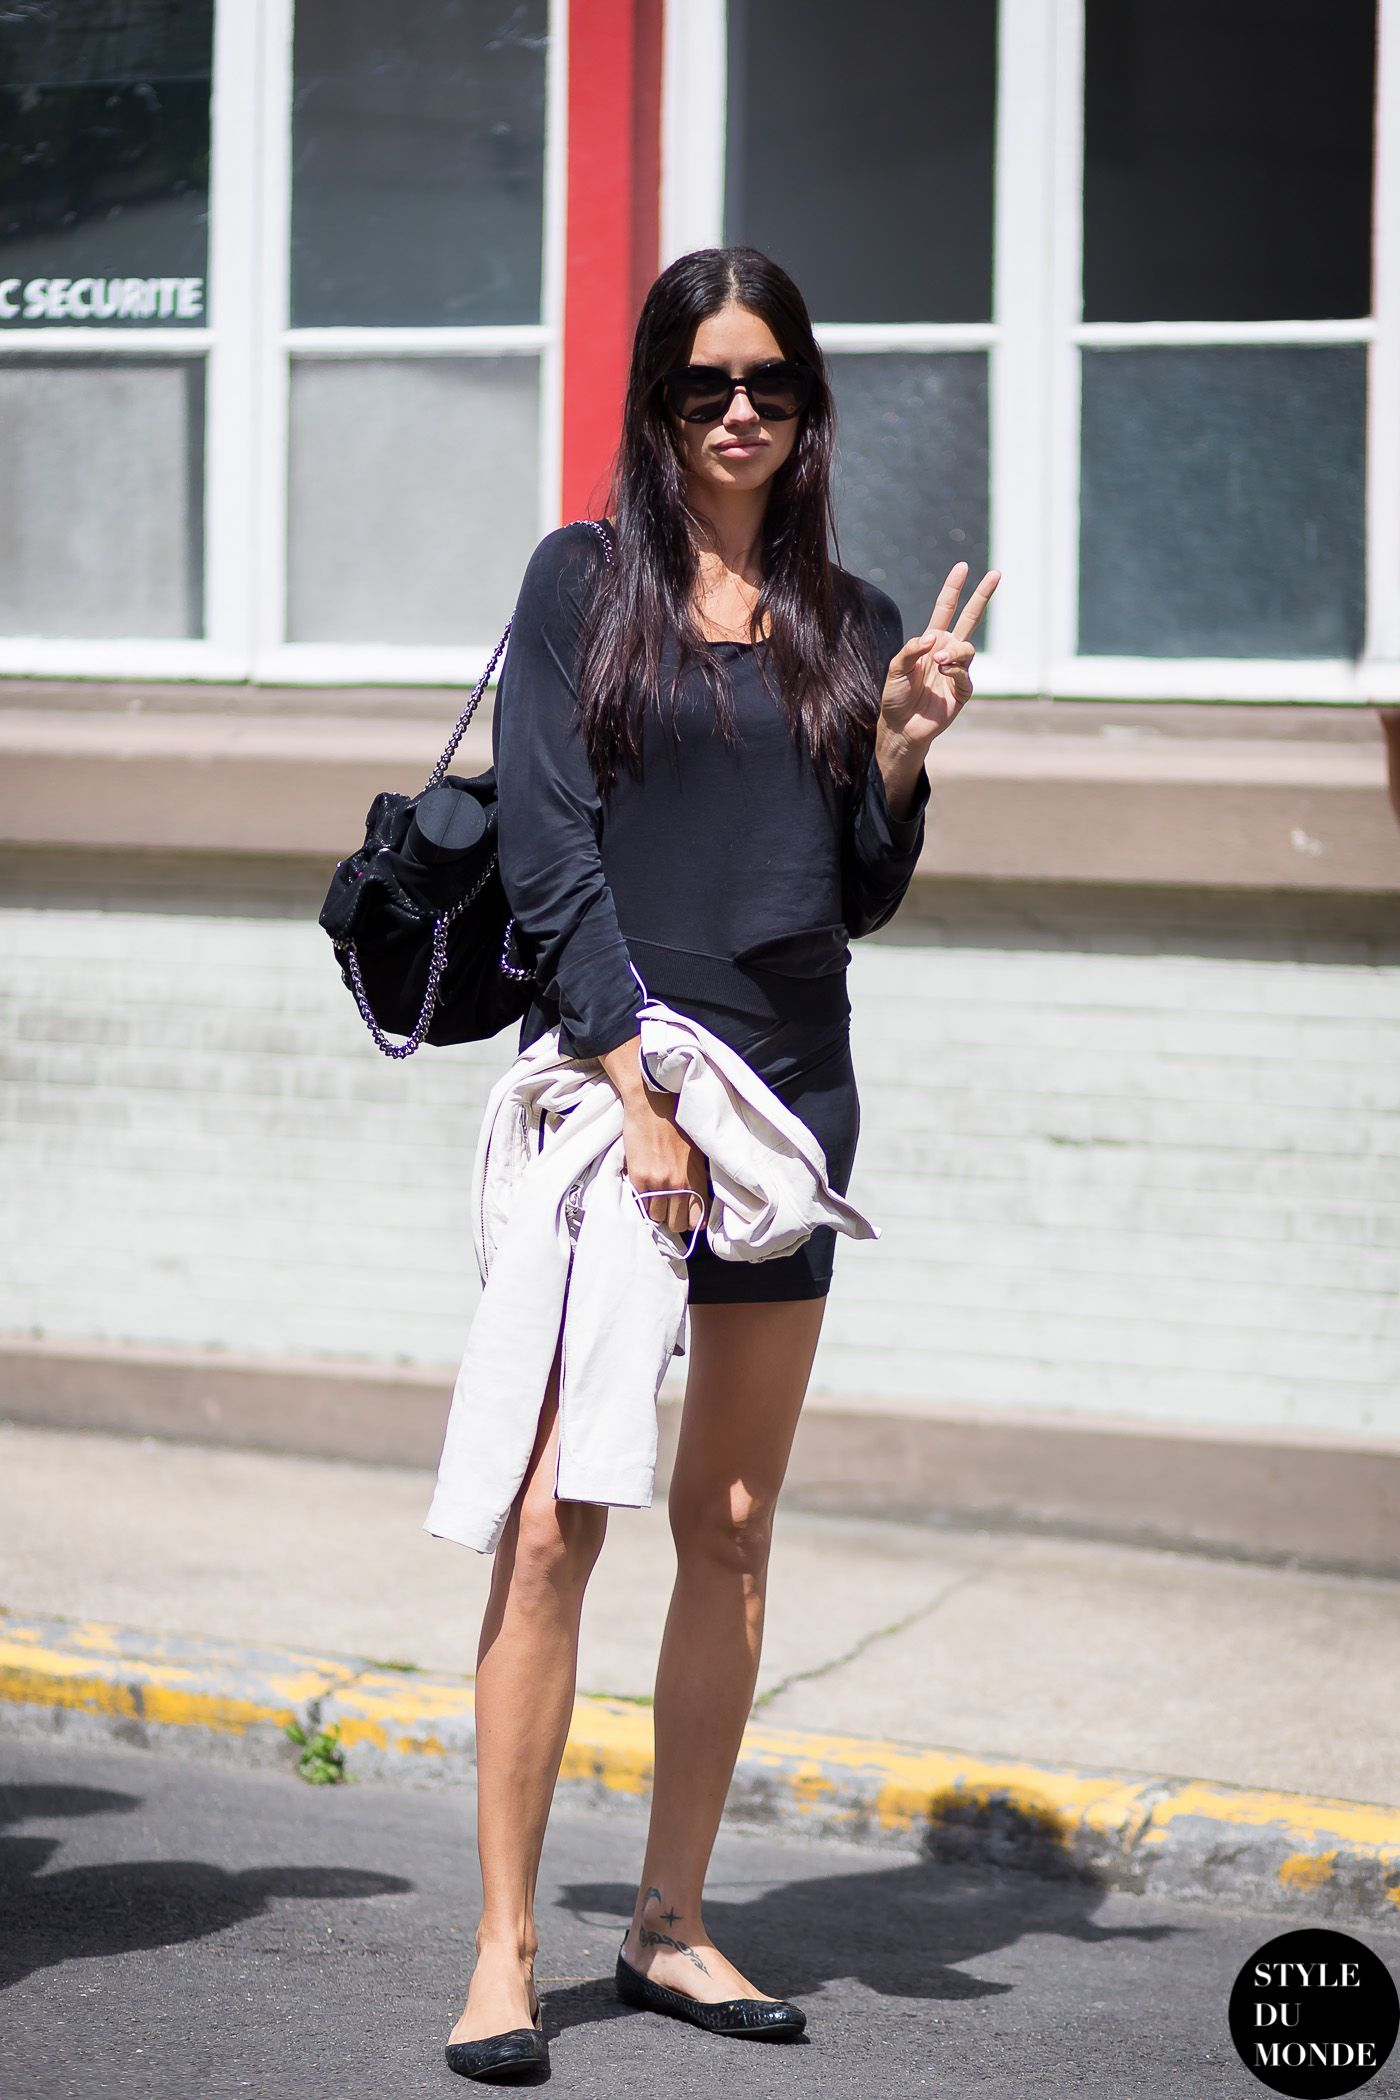 Paris Mens Fashion Week Spring 2015 Street Style Adriana Lima My Meitaviamp039s Kulot Denim Midi Culottes By Styledumonde Blog